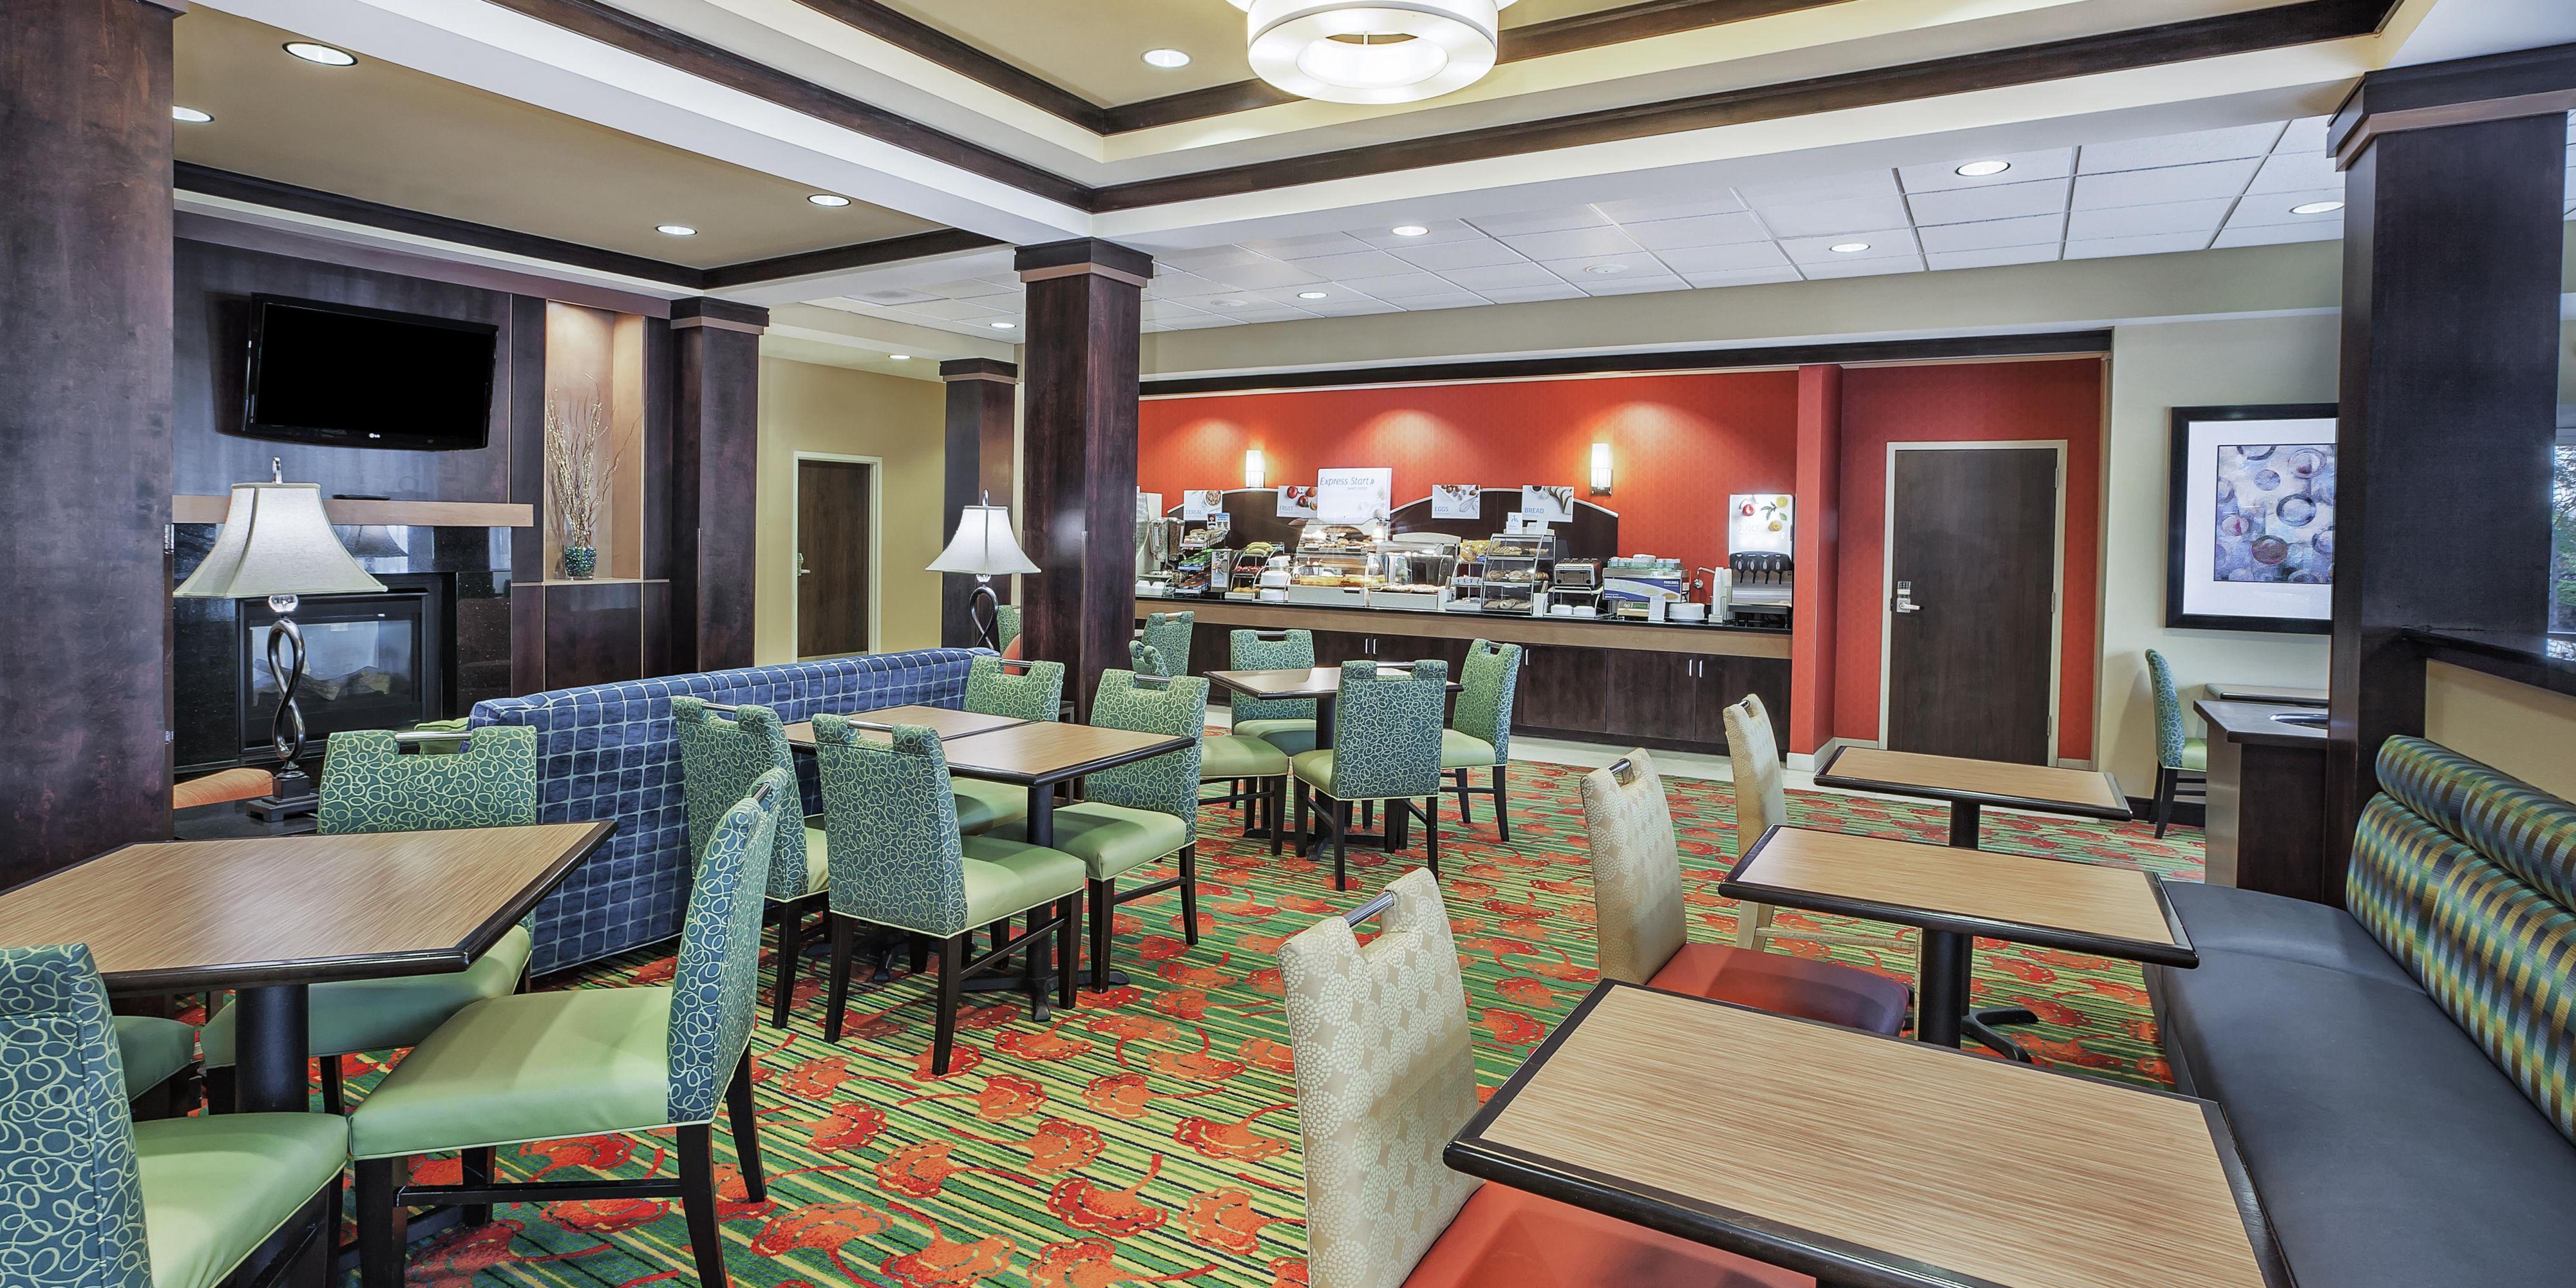 Holiday Inn Express & Suites Dayton South - I-675 IHG Hotel